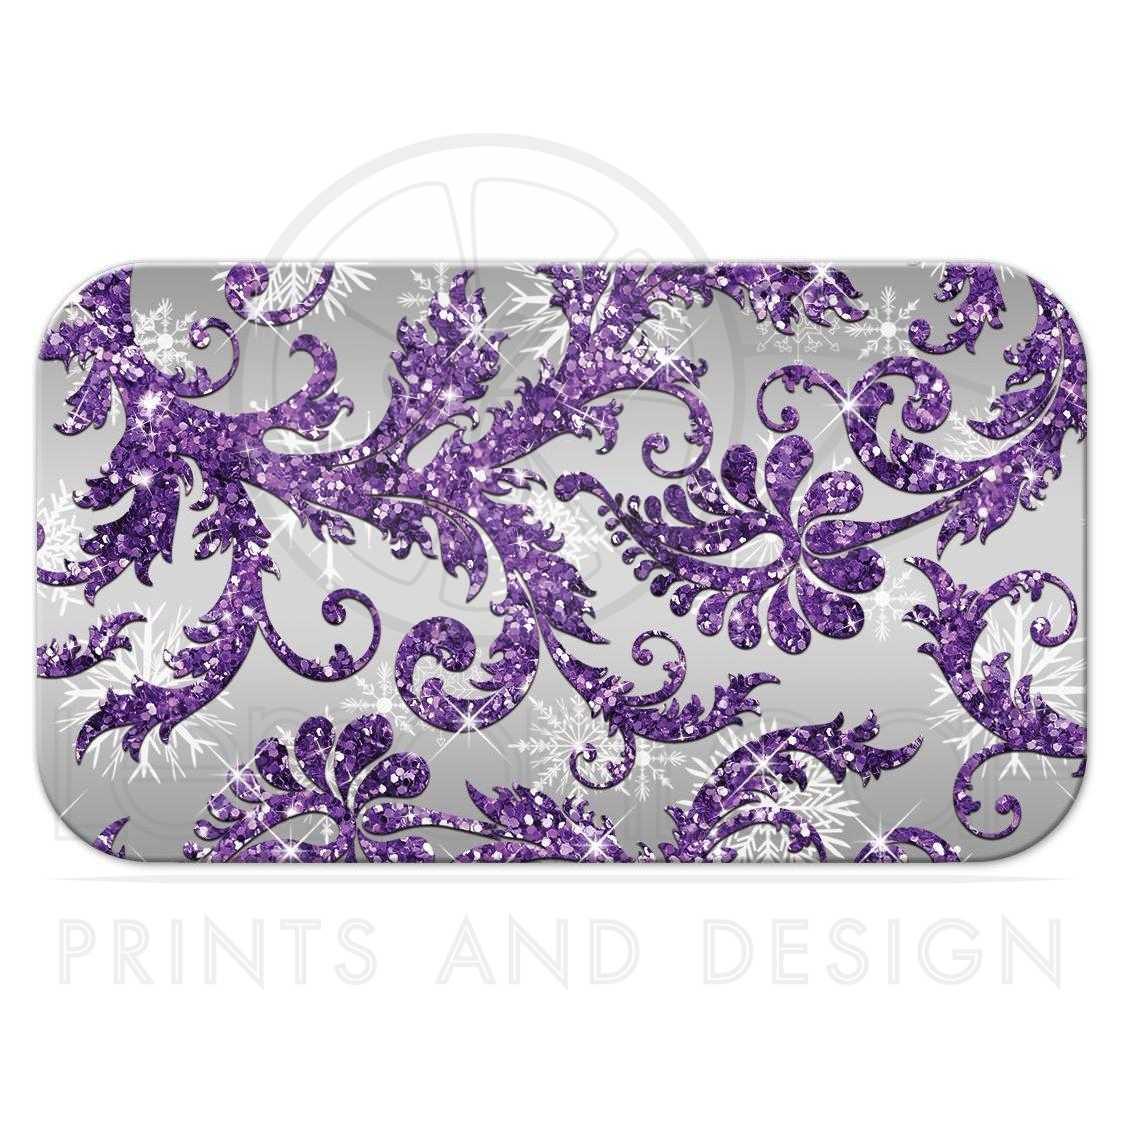 Purple And Silver Wedding Backgrounds: Winter Wonderland Wedding Reception Card